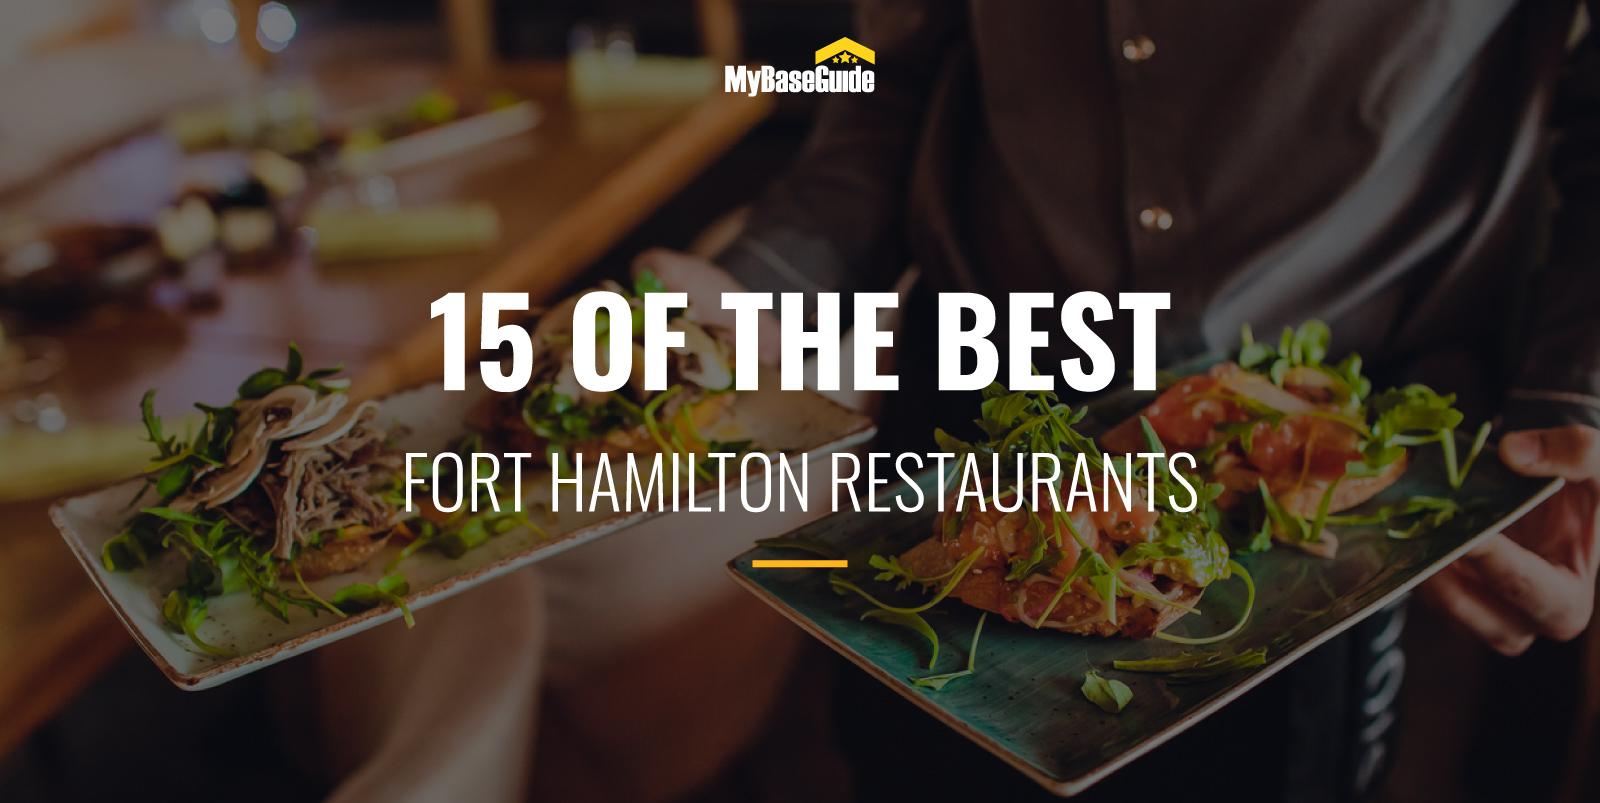 15 of the Best Fort Hamilton Restaurants